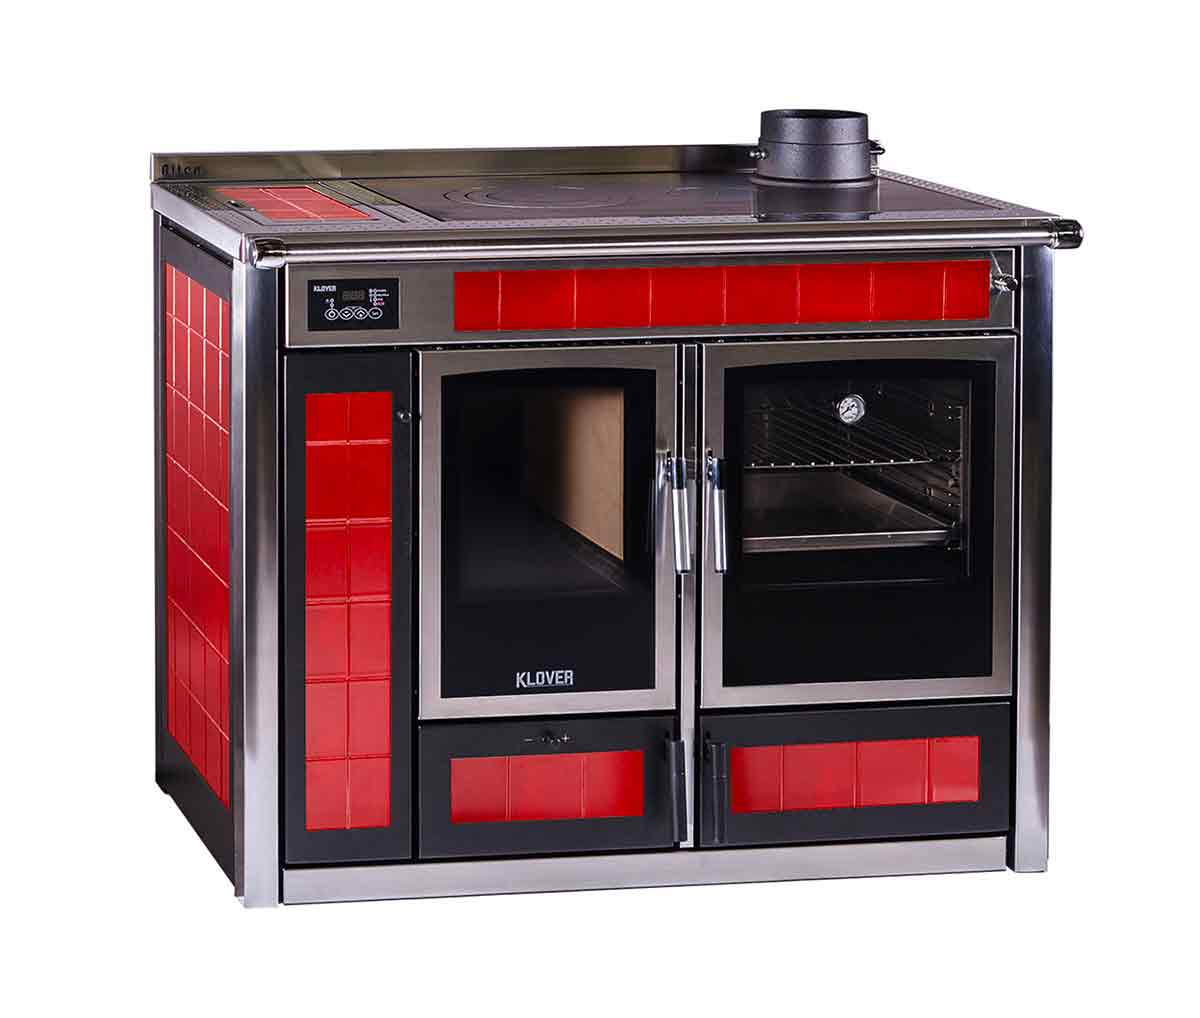 Termostufa cucina a legna ALTEA 110 - 34,9 KW - Klover Srl (Italia)